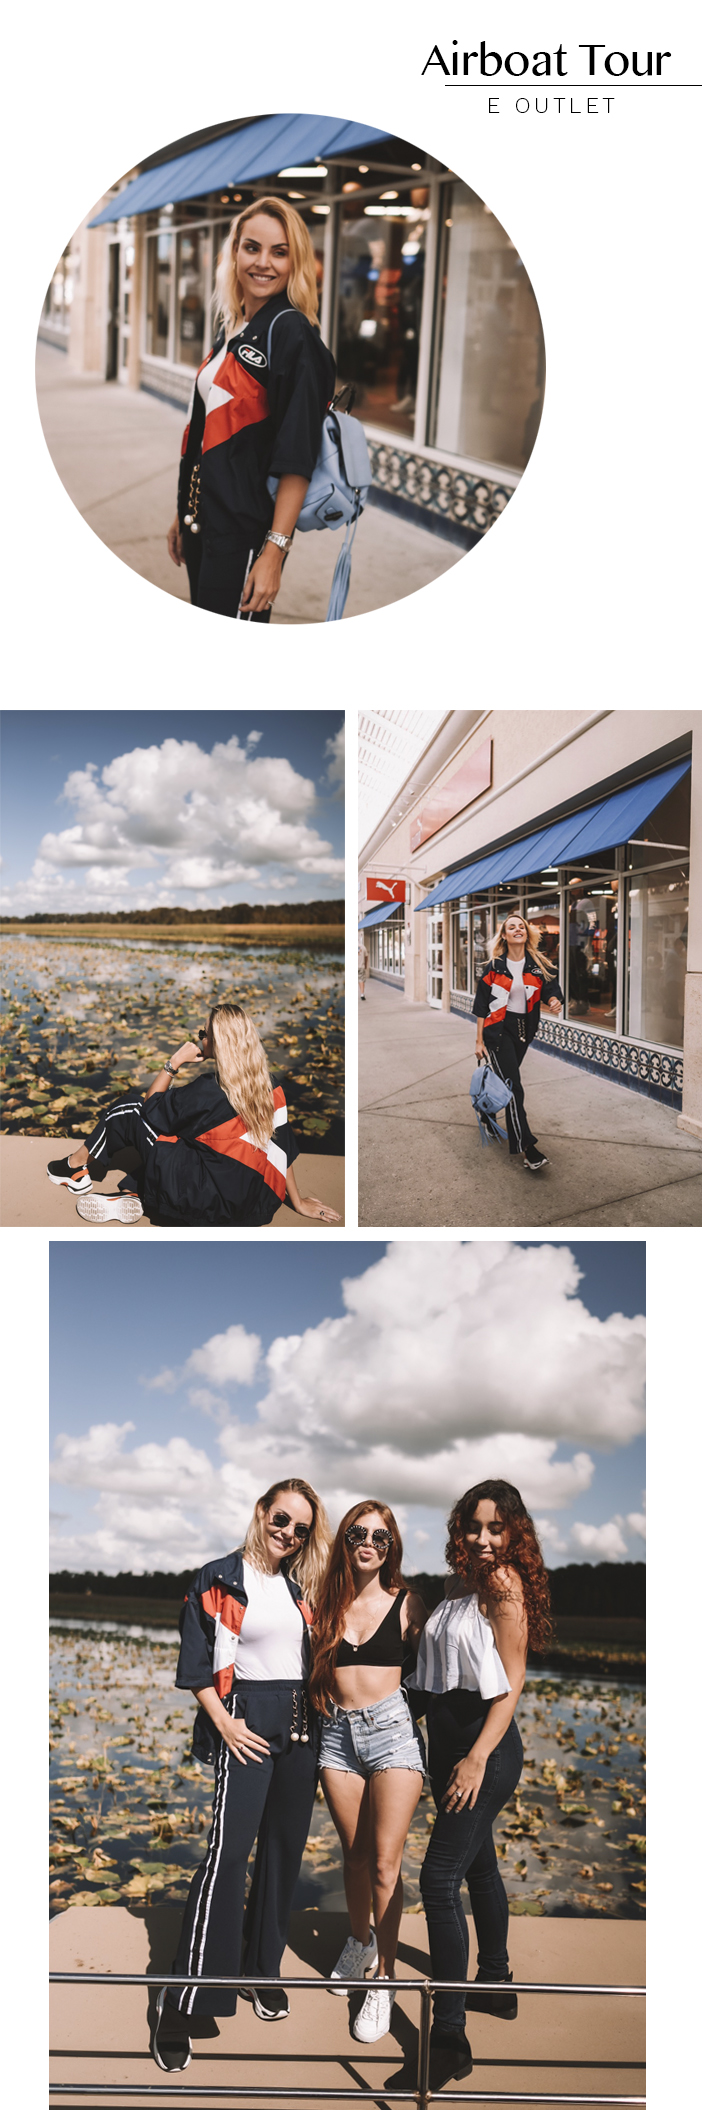 Diário de Bordo: Layla em Kissimmee - Airboat Tour e Outlet